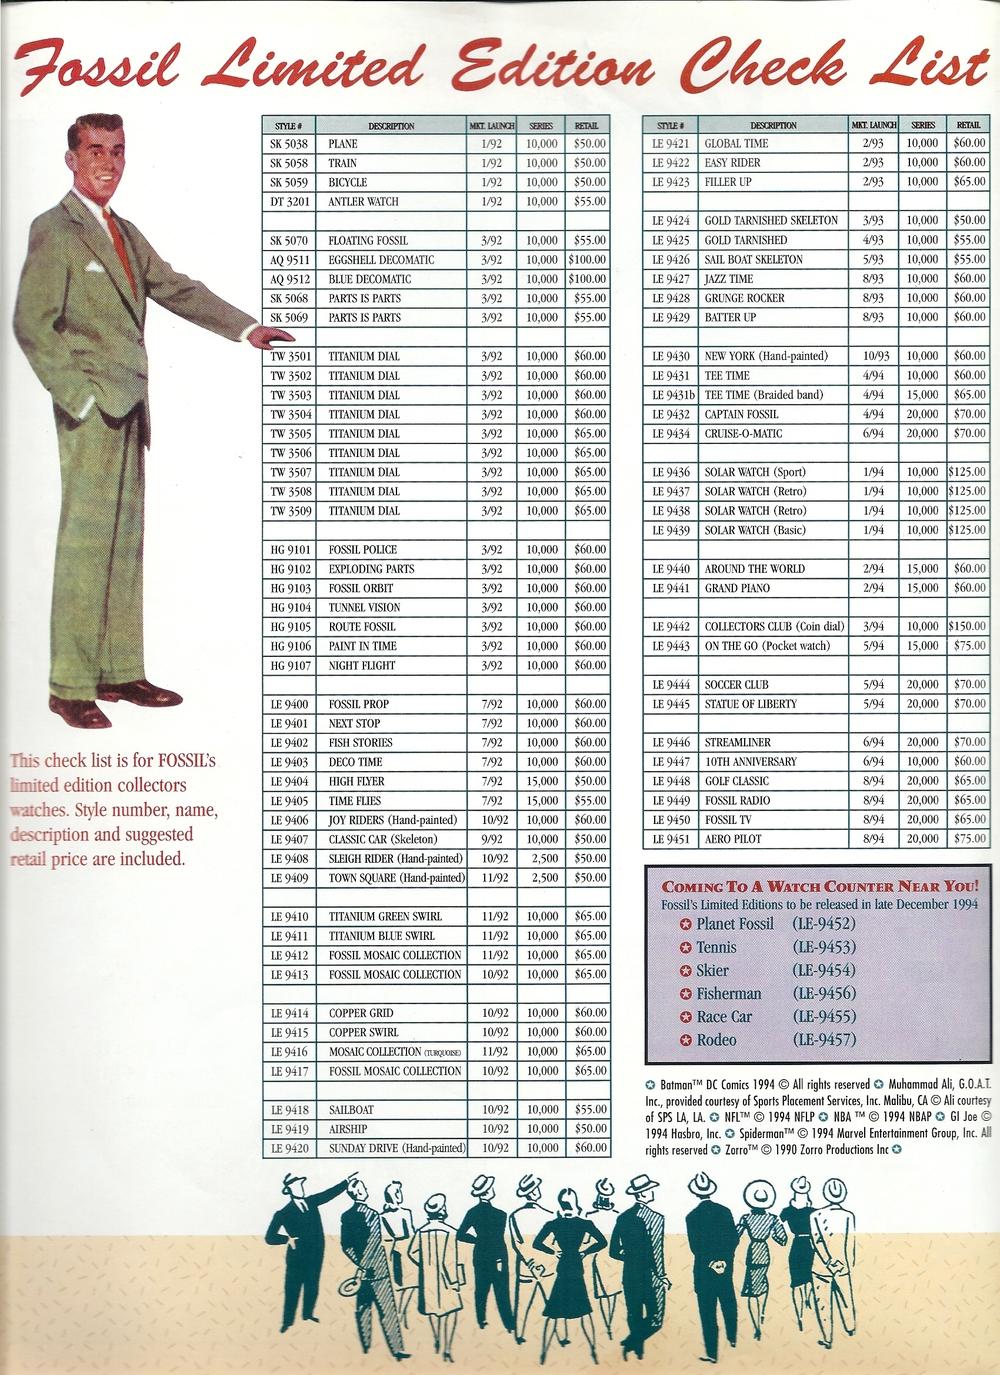 Fossil_Limited_Edition_Checklist.jpg